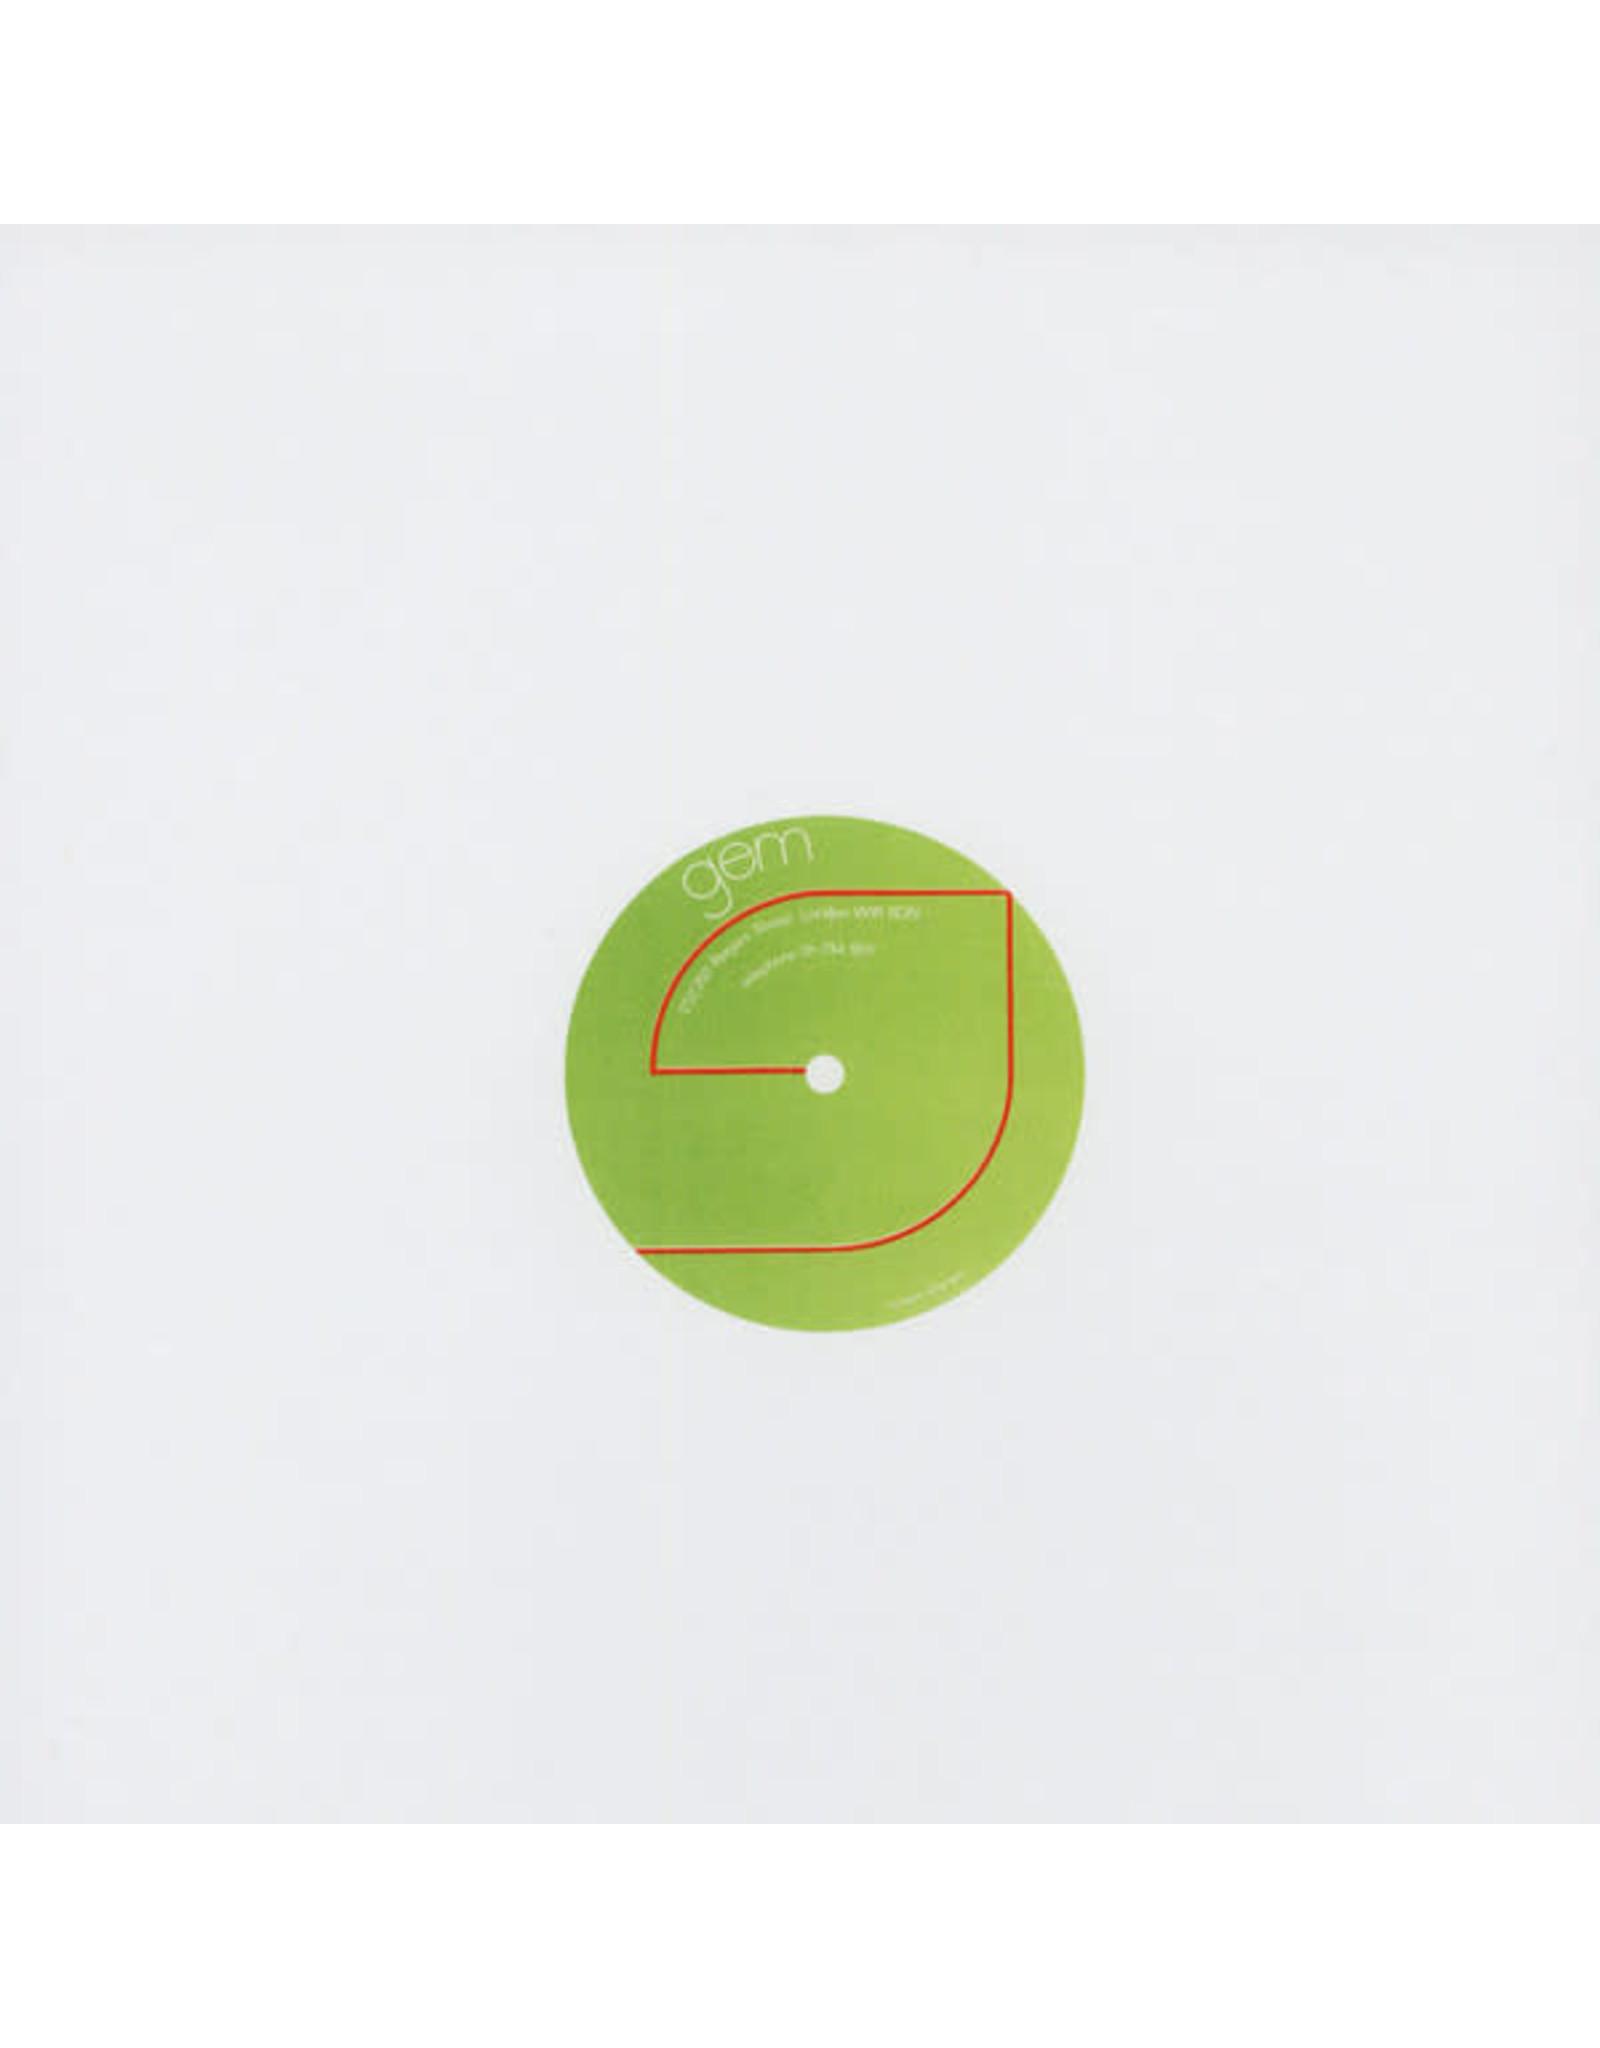 Vinyl David Bowie - Bowie Promo